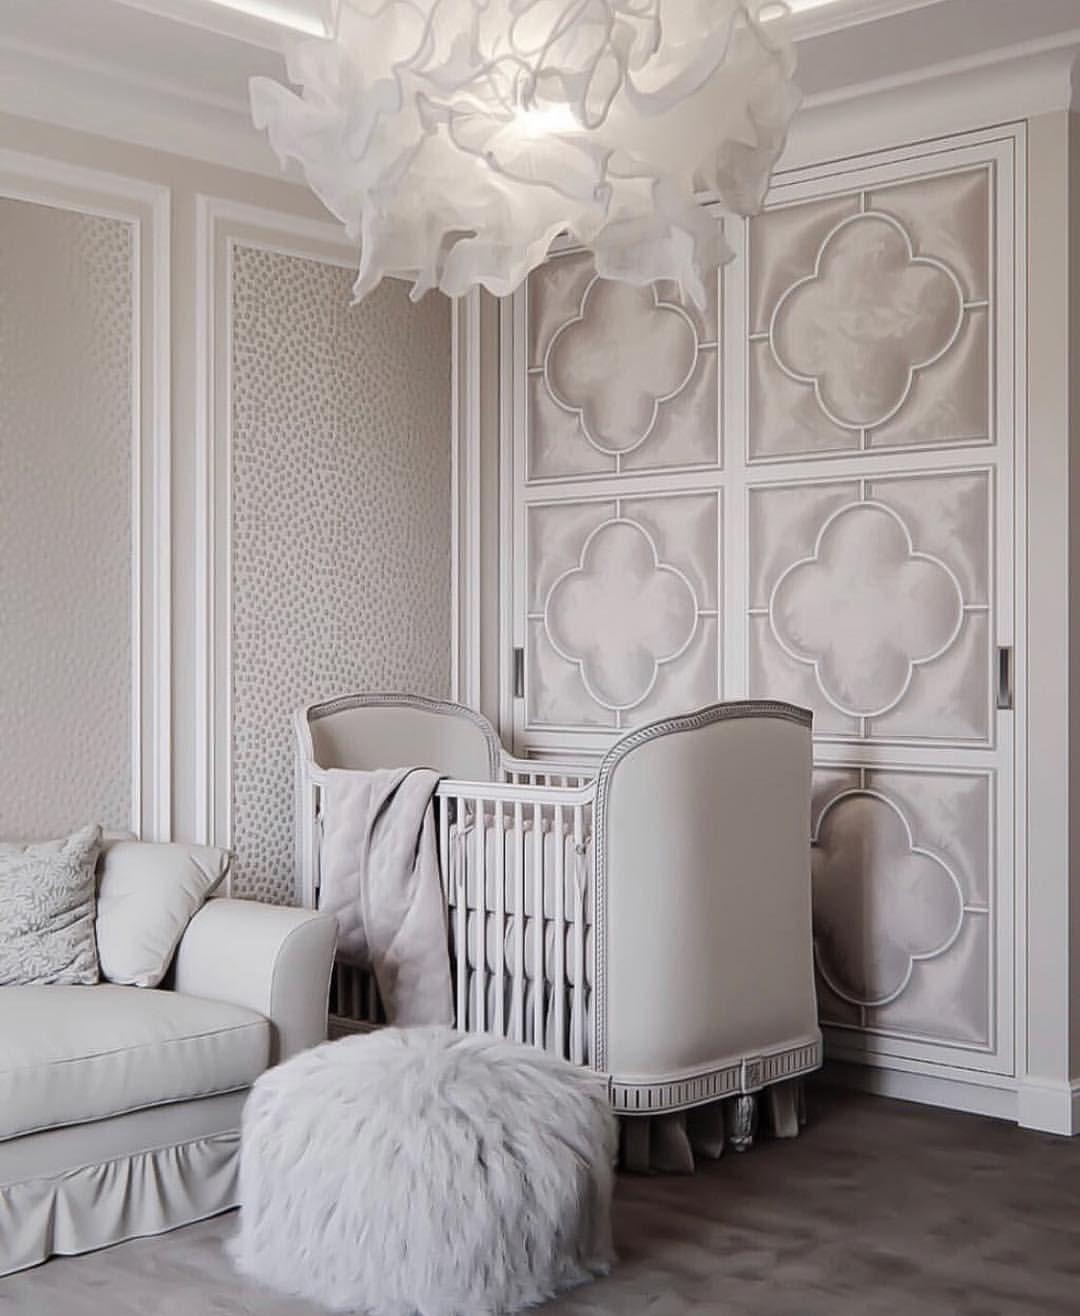 Chicness In A Nursery Via Balcon Studio Furniture Italian